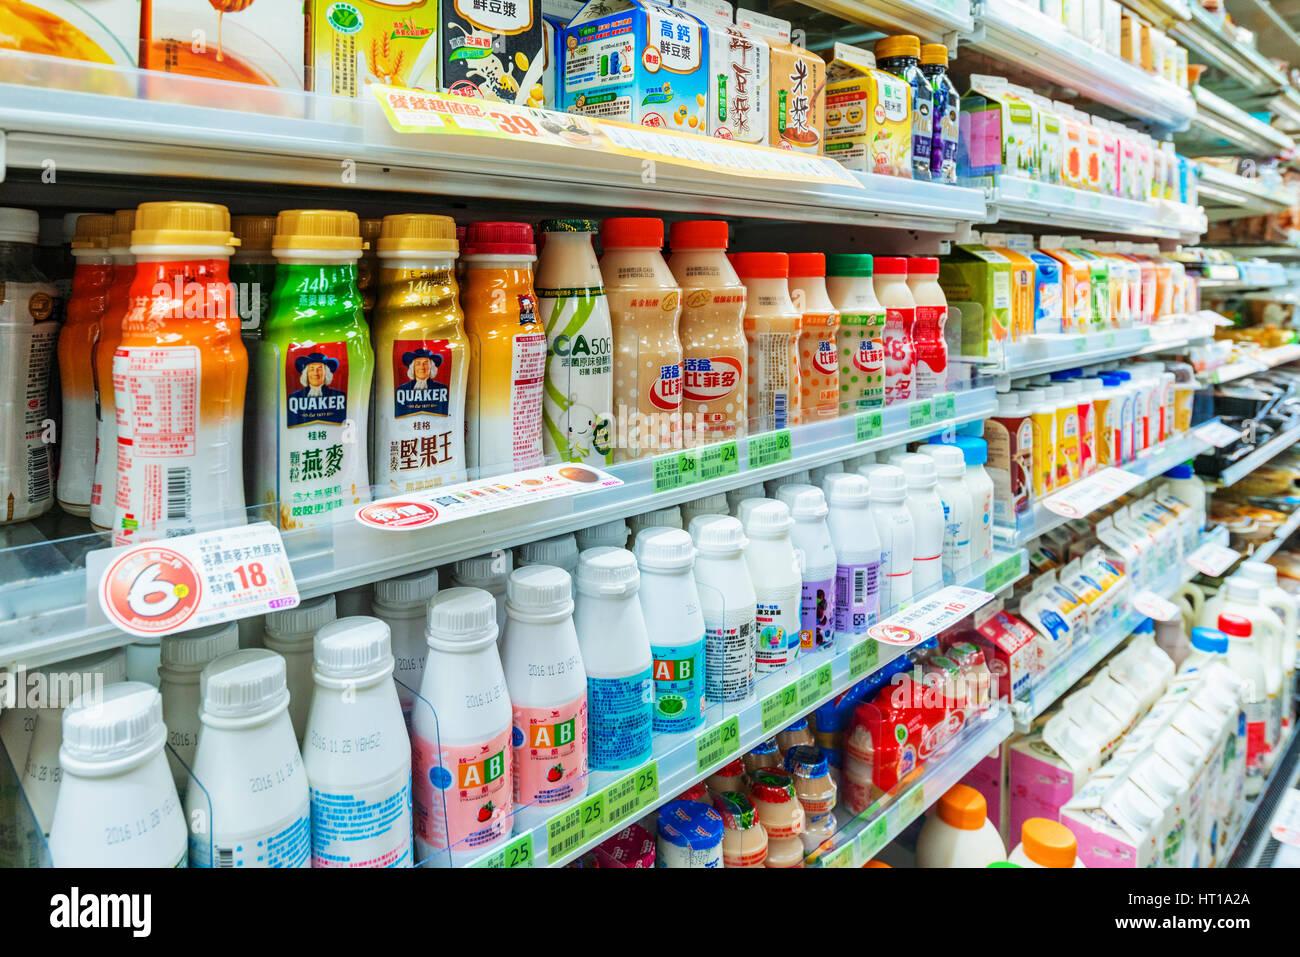 Produce Mart Stock Photos & Produce Mart Stock Images - Alamy